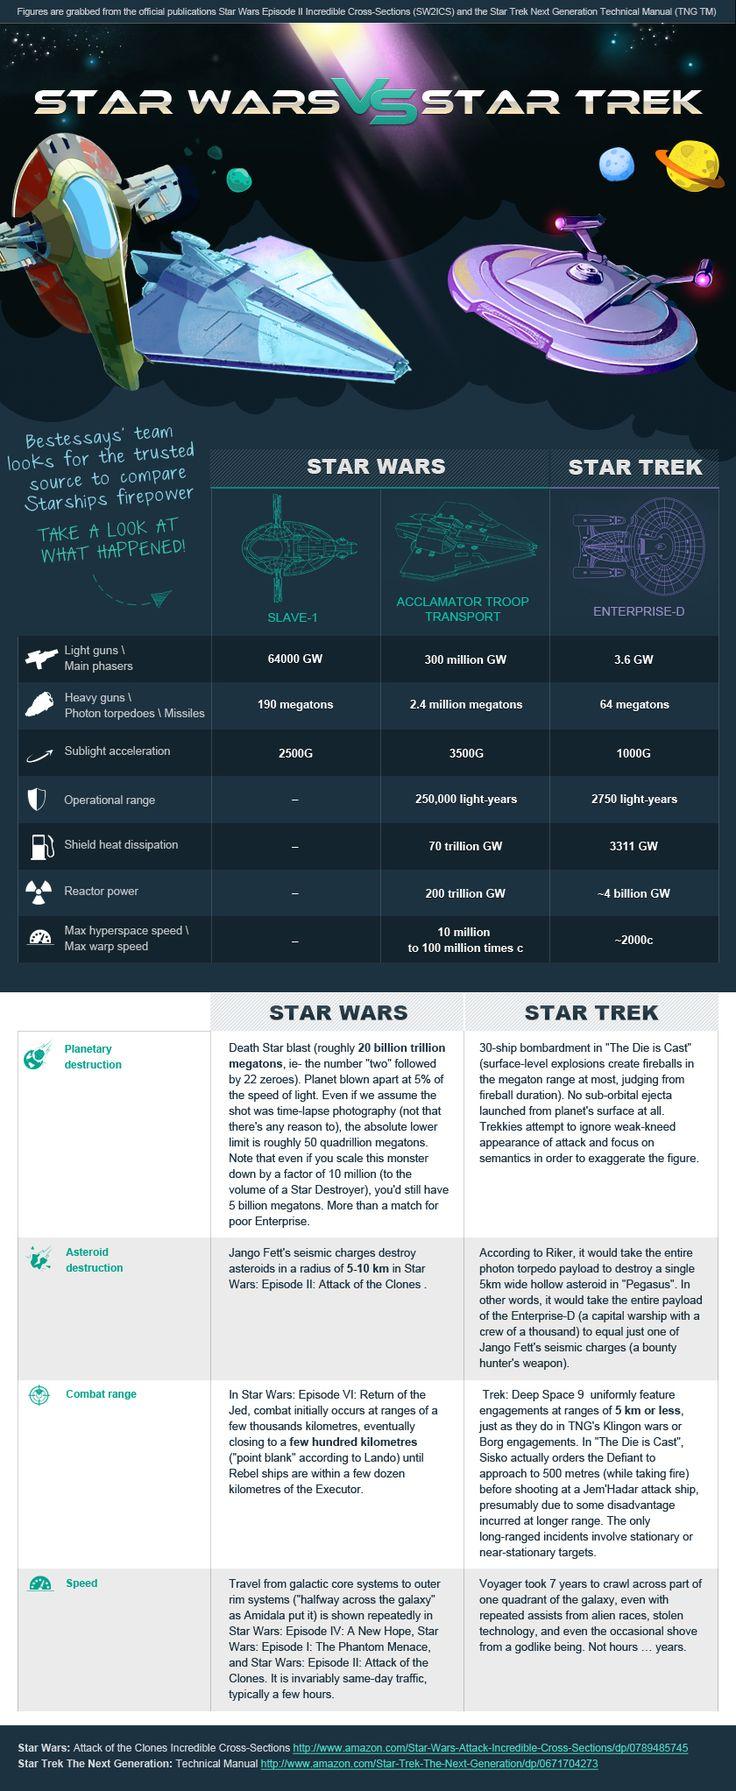 Star Wars vs. Star Trek: The Starships Compared [Infographic]